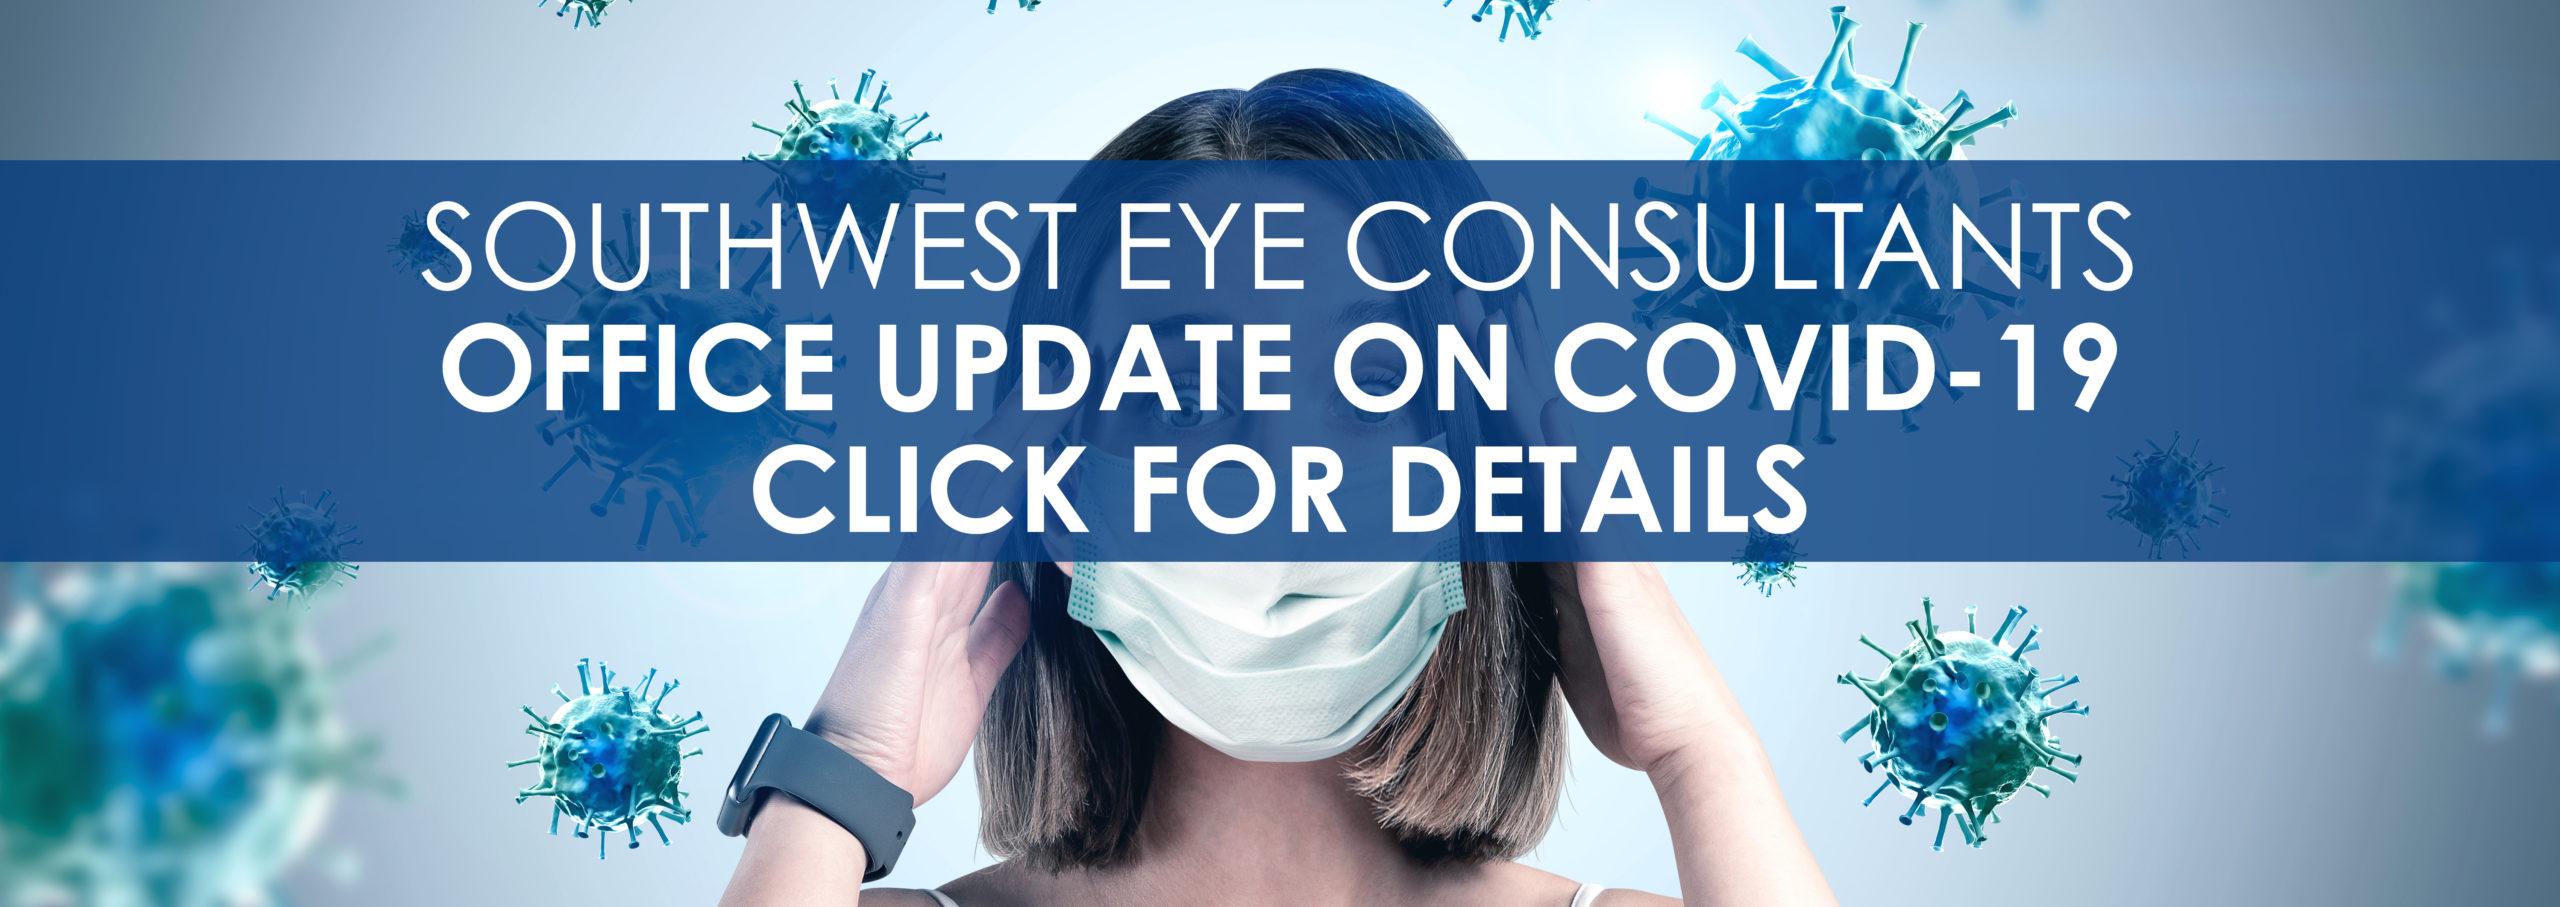 Southwest Eye Care - eye diseases - macular degeneration - Cataracts - Dry Eye Disease - Conjunctivitis - Corneal Infections - Eye Doctors in Durango, CO - Ophthalmologists Durango, CO - Ophthalmologists near me